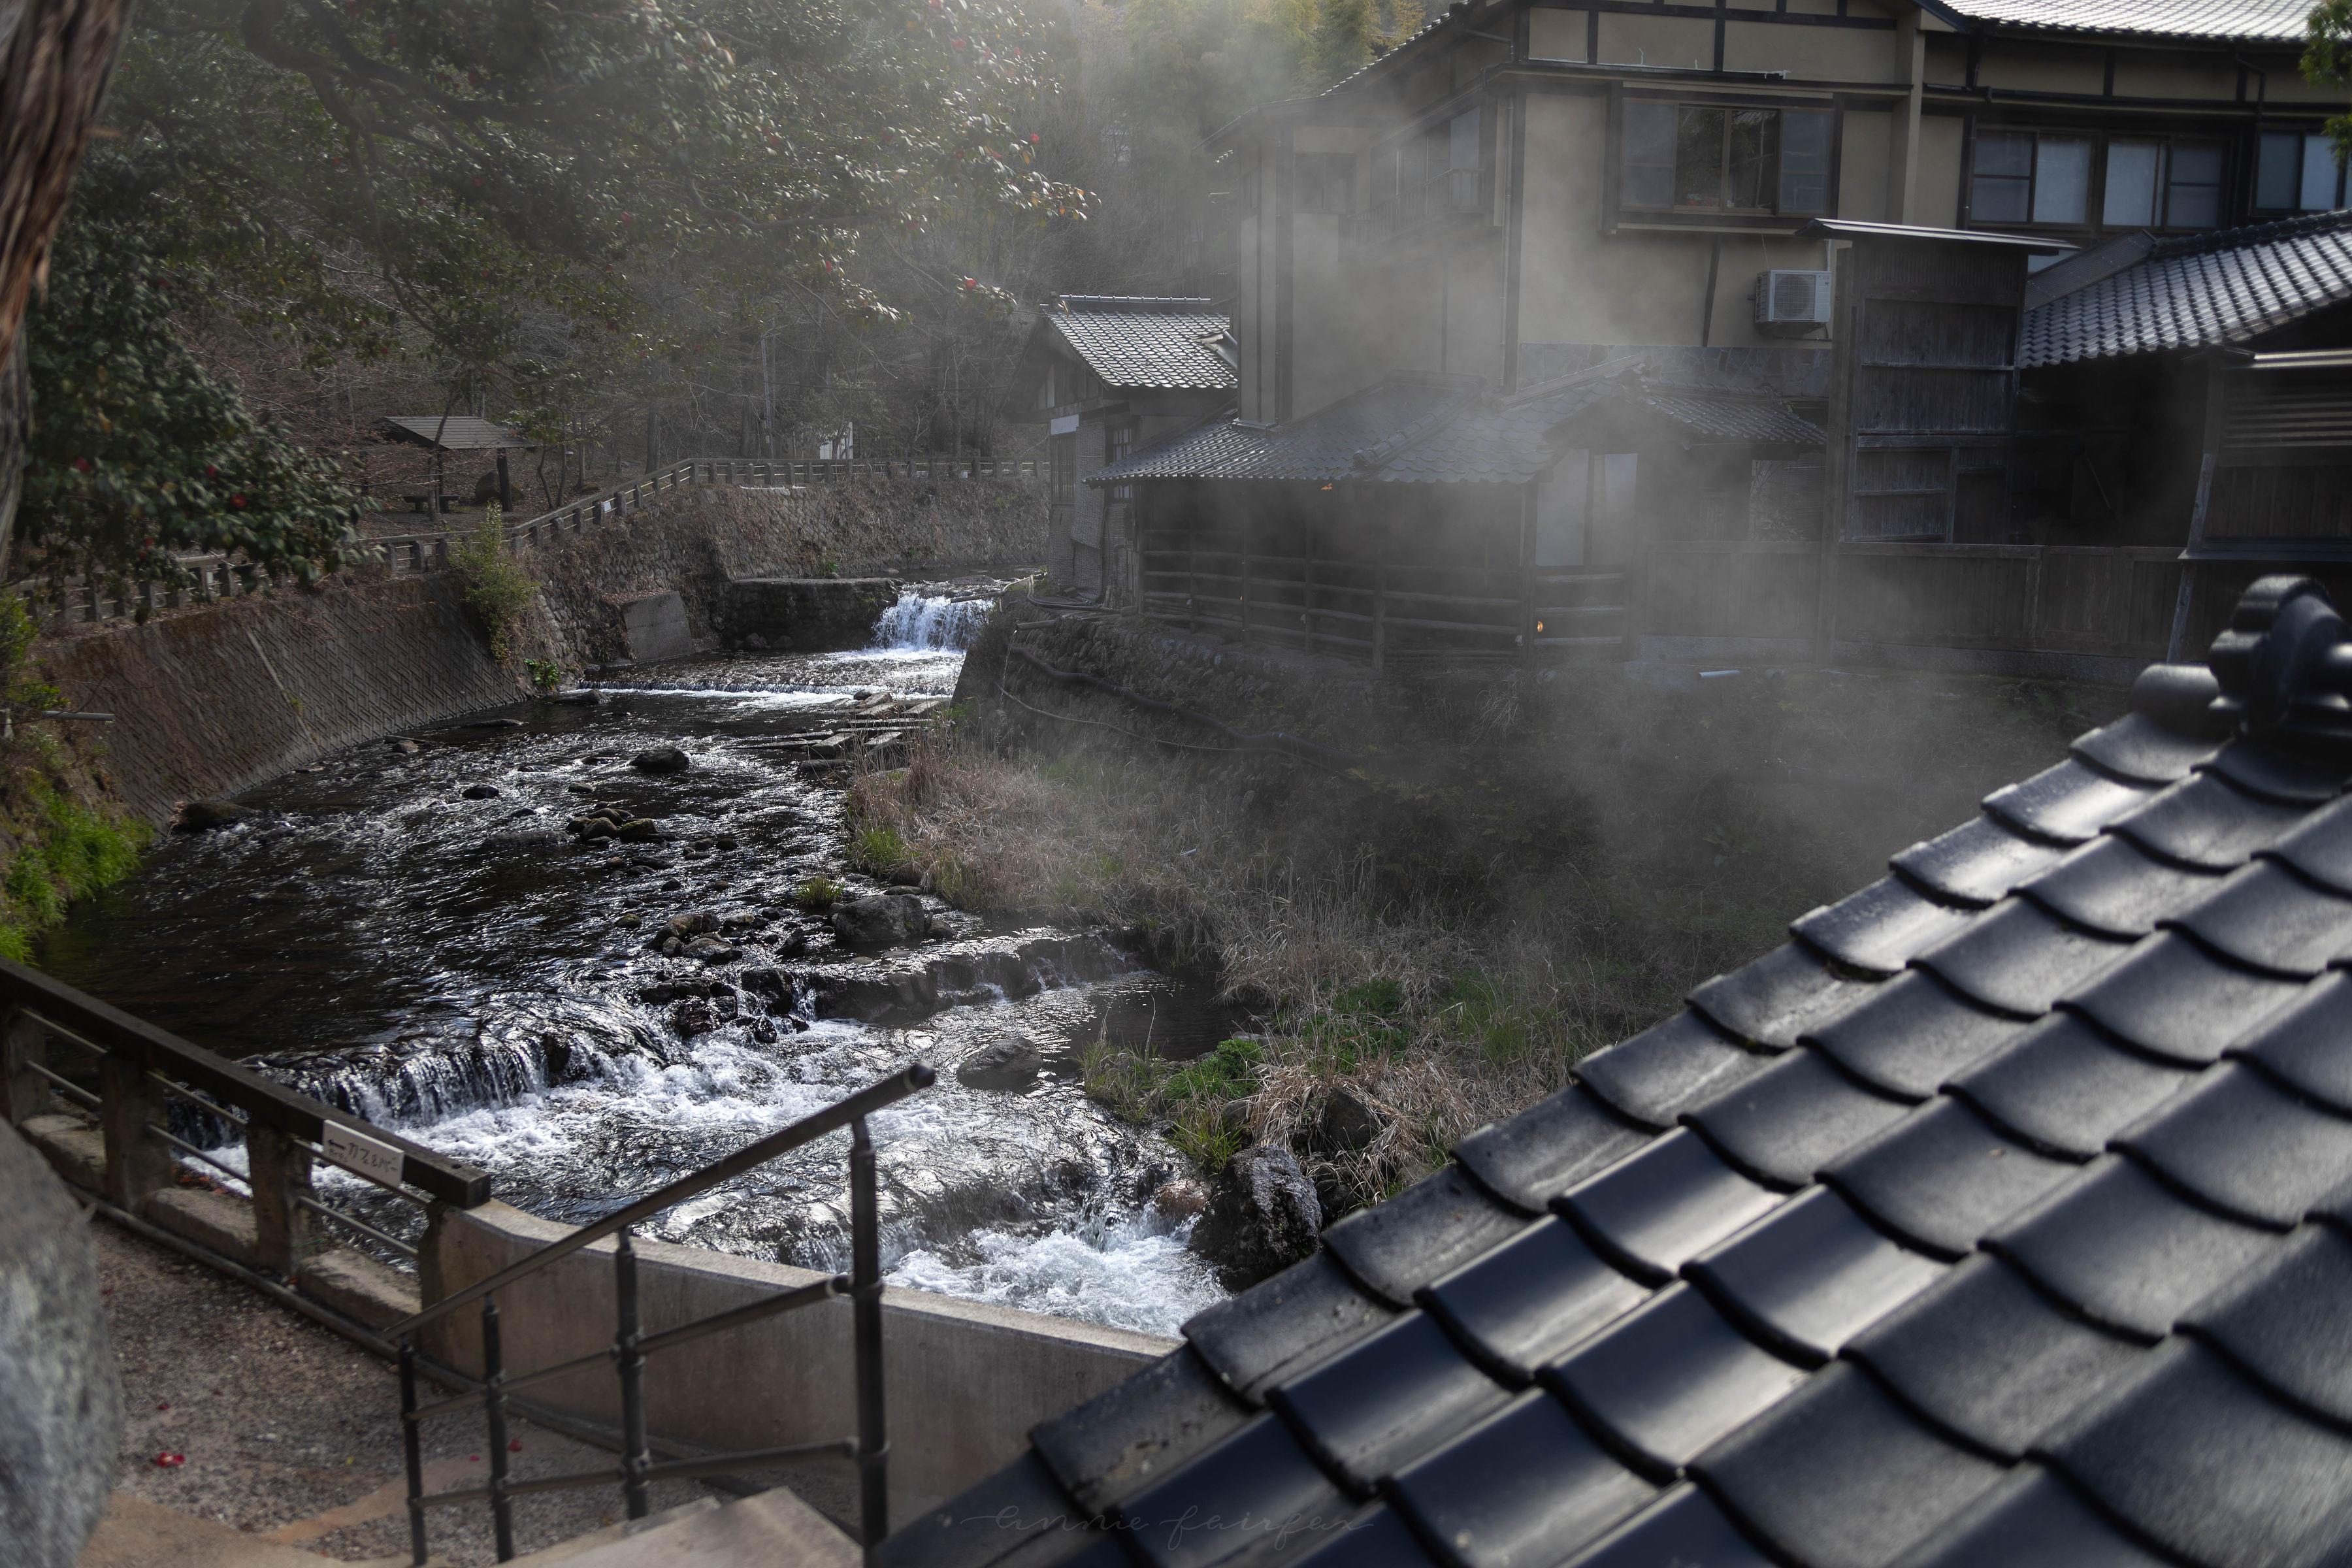 Hot Springs Resort on River Chikugo Luxury Hotels of the World Fujiya Ryokan Kurokawa Onsen, Southern Japan